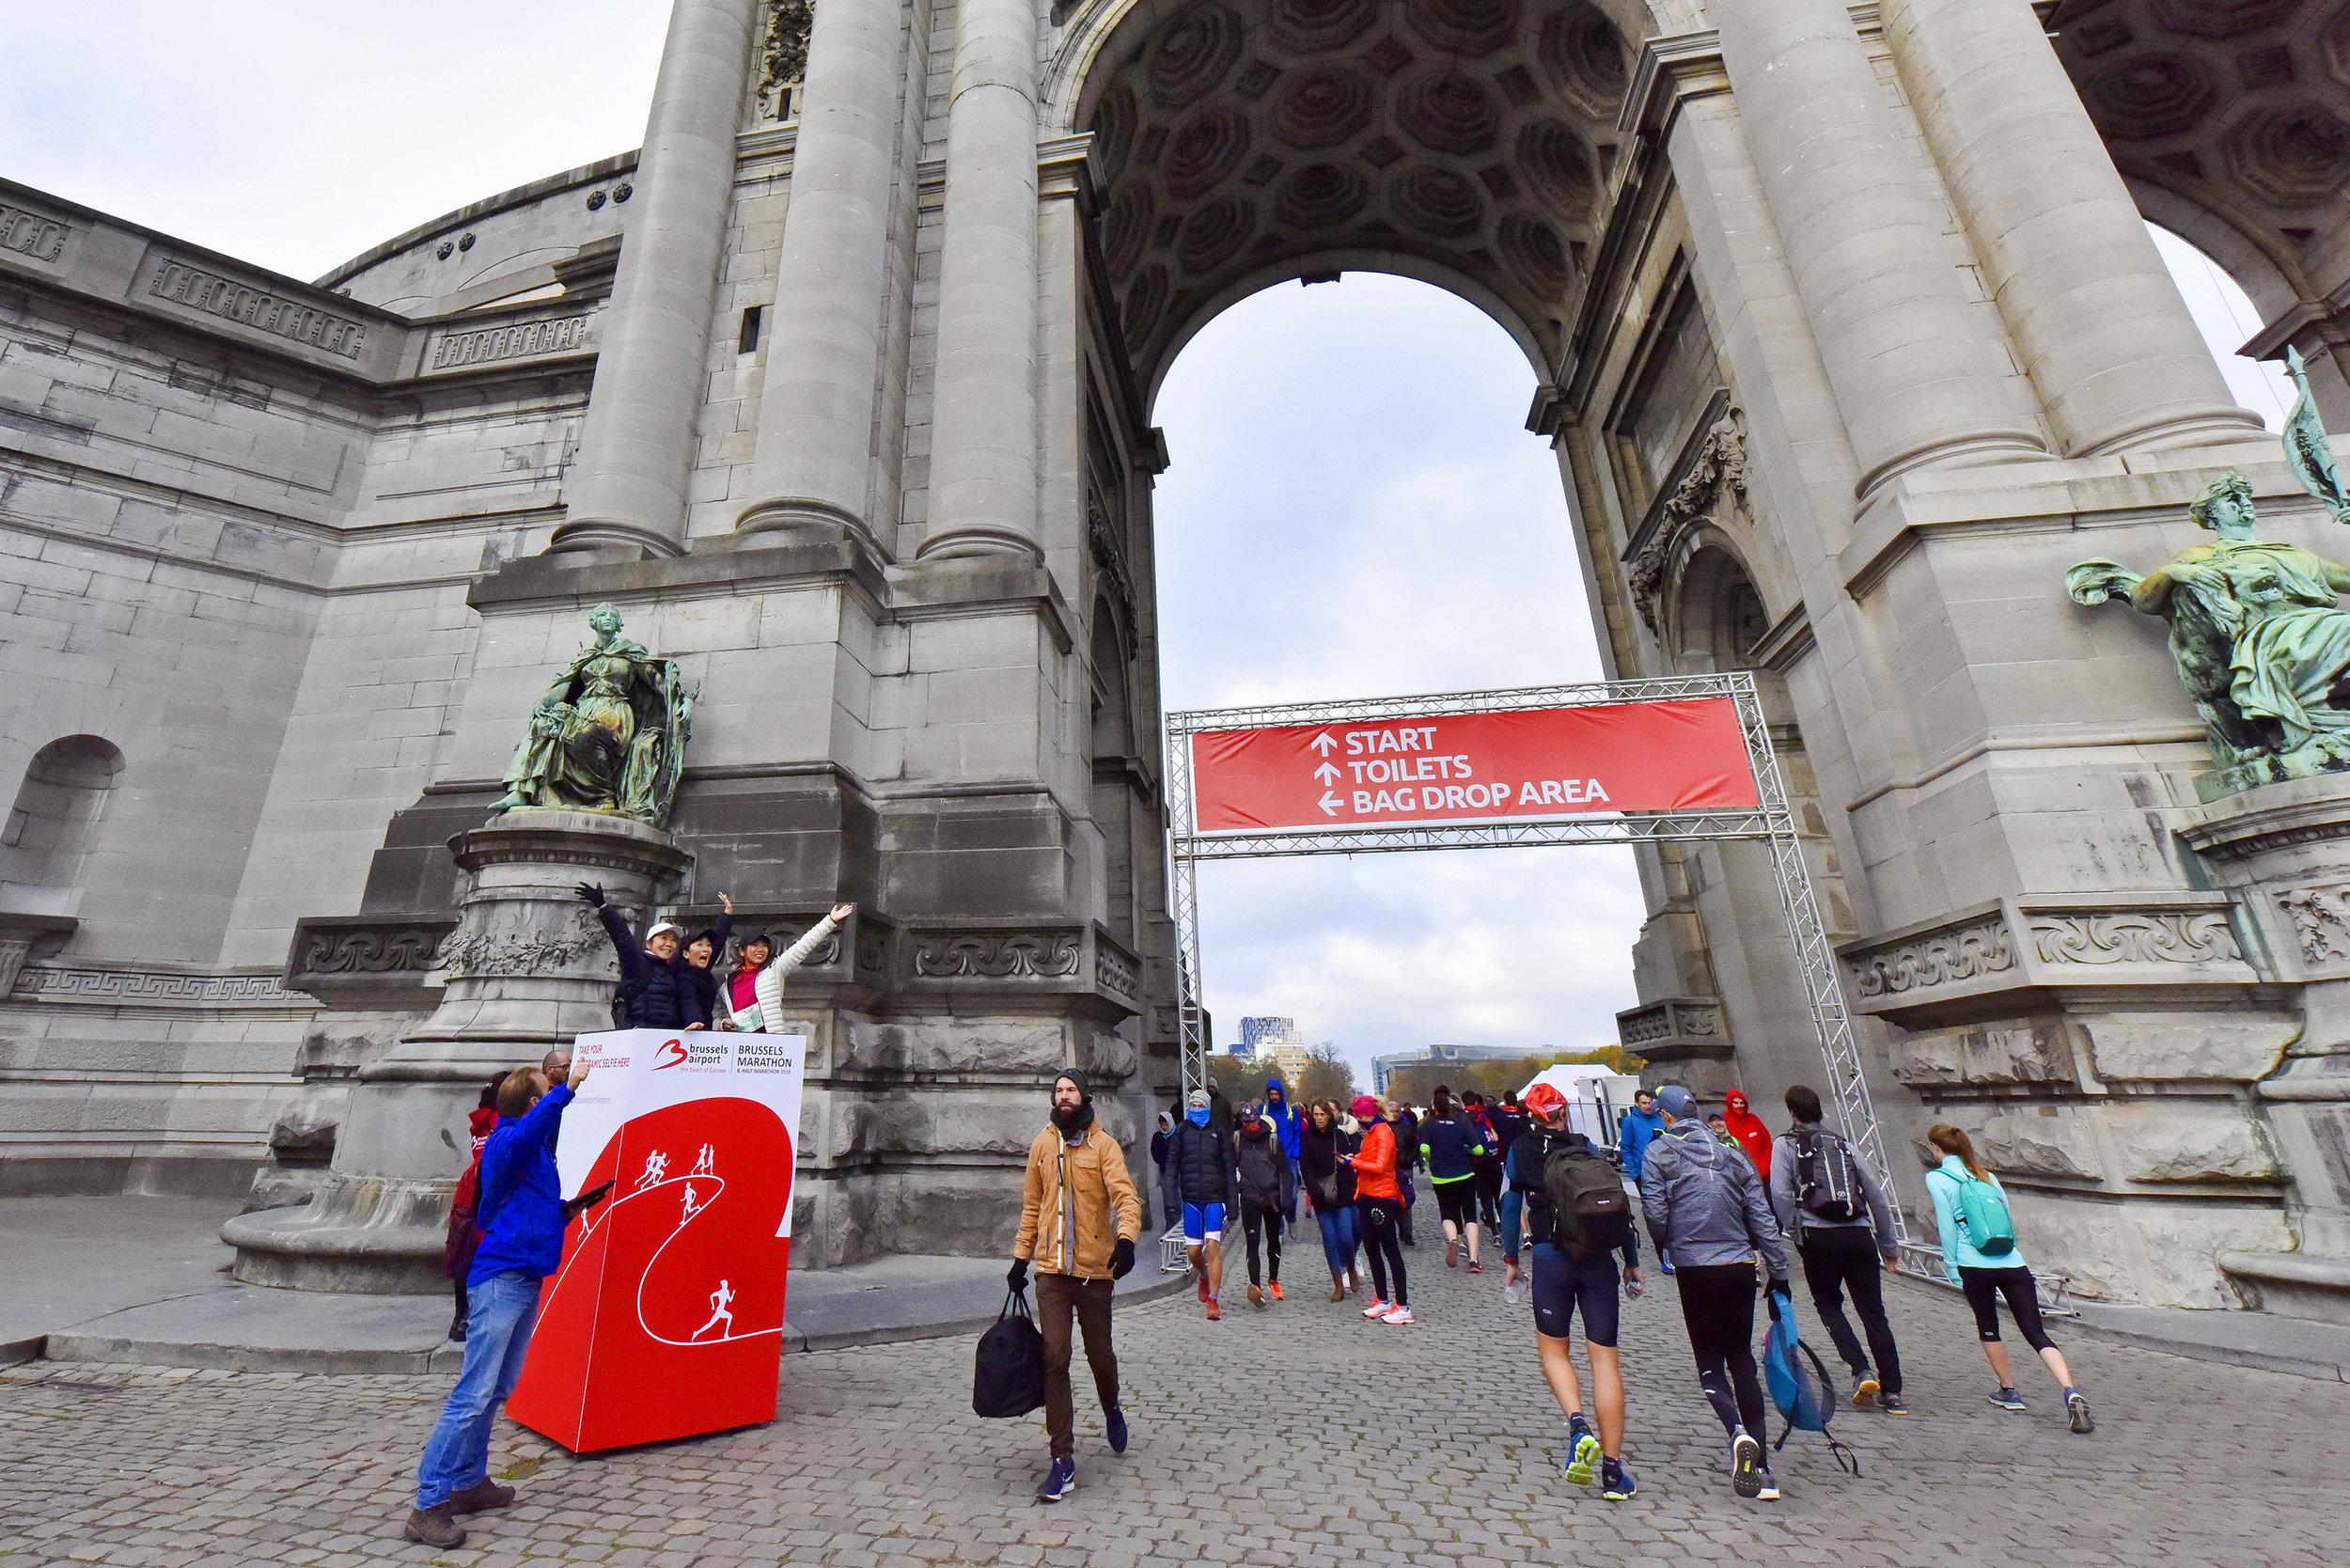 PANORA-ME_Brussels-Marathon-2018_01.jpg